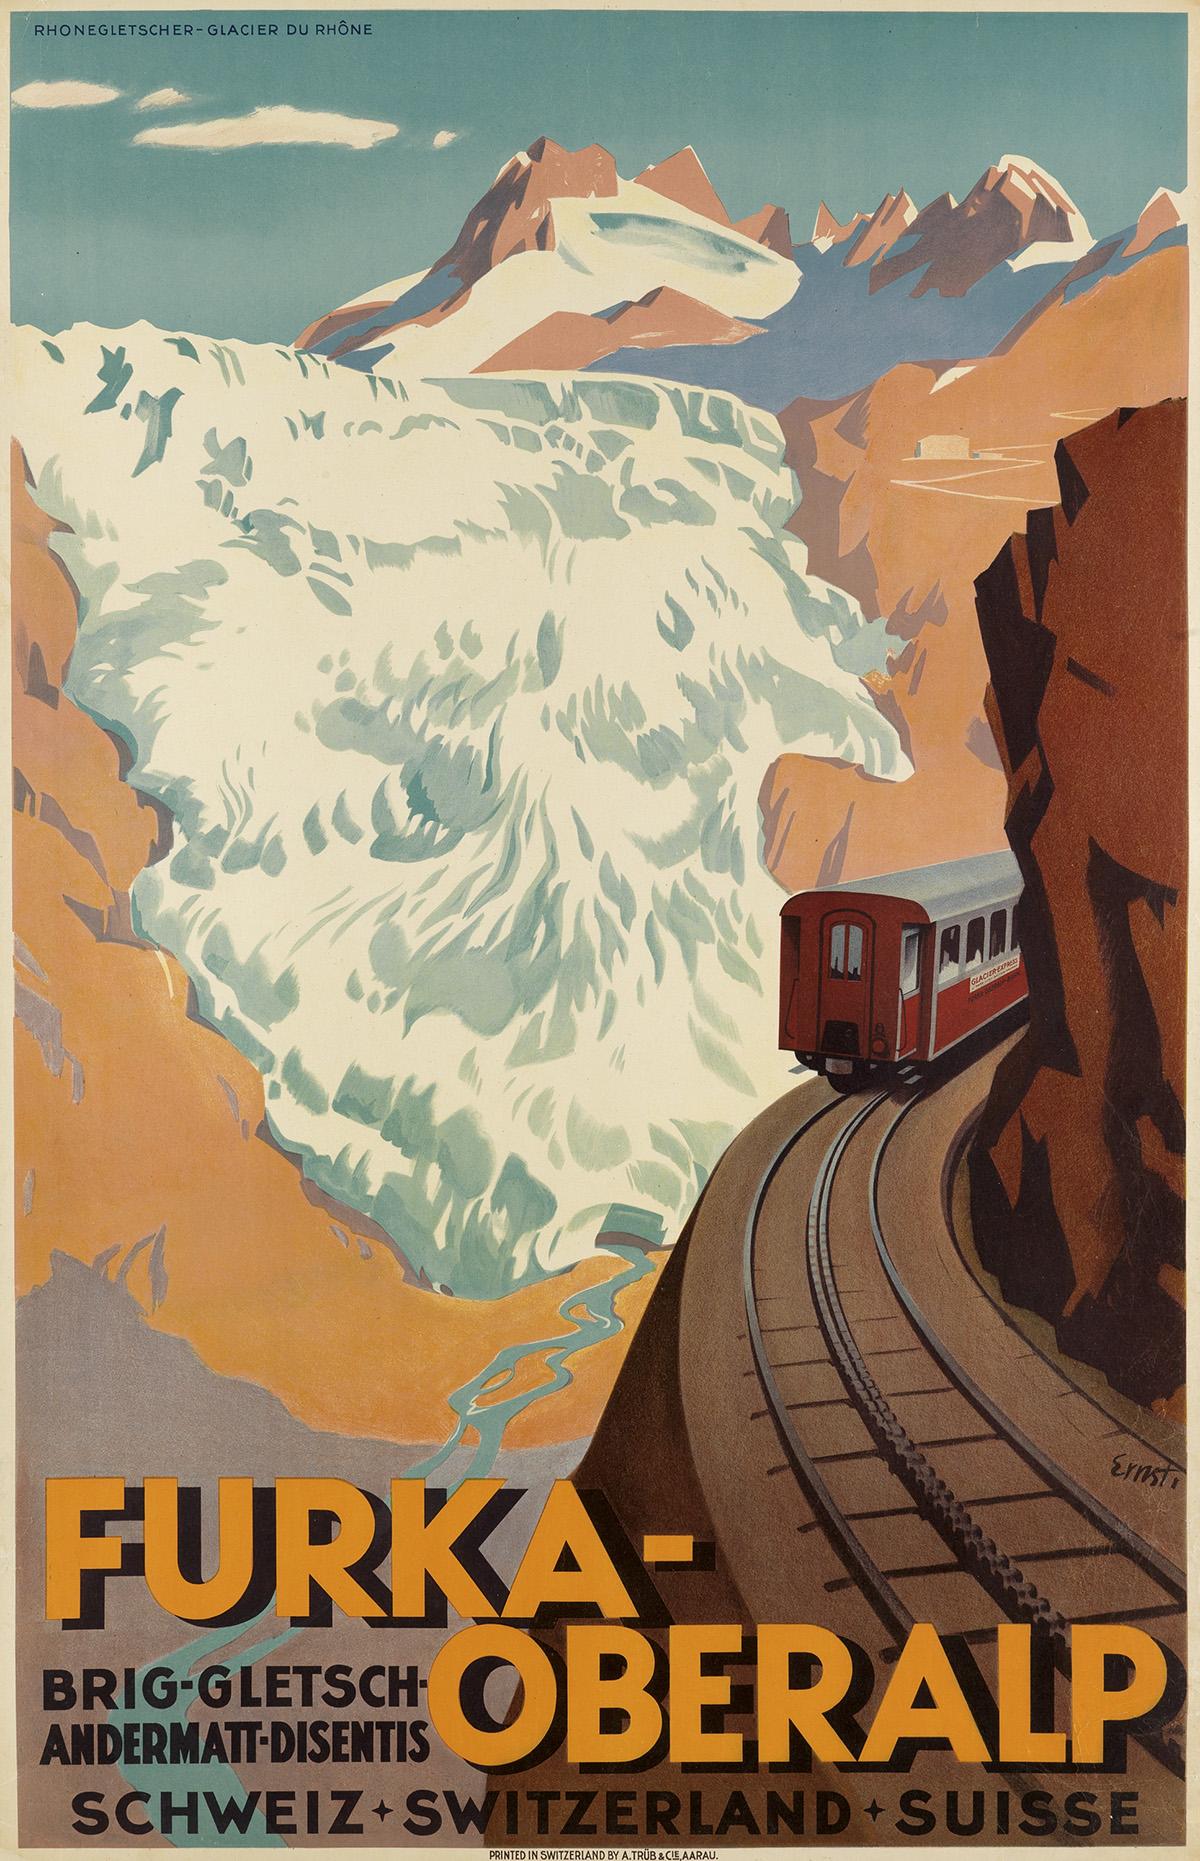 OTTO-ERNST-(1884-1967)-FURKA---OBERALP-1930-39x25-inches-99x